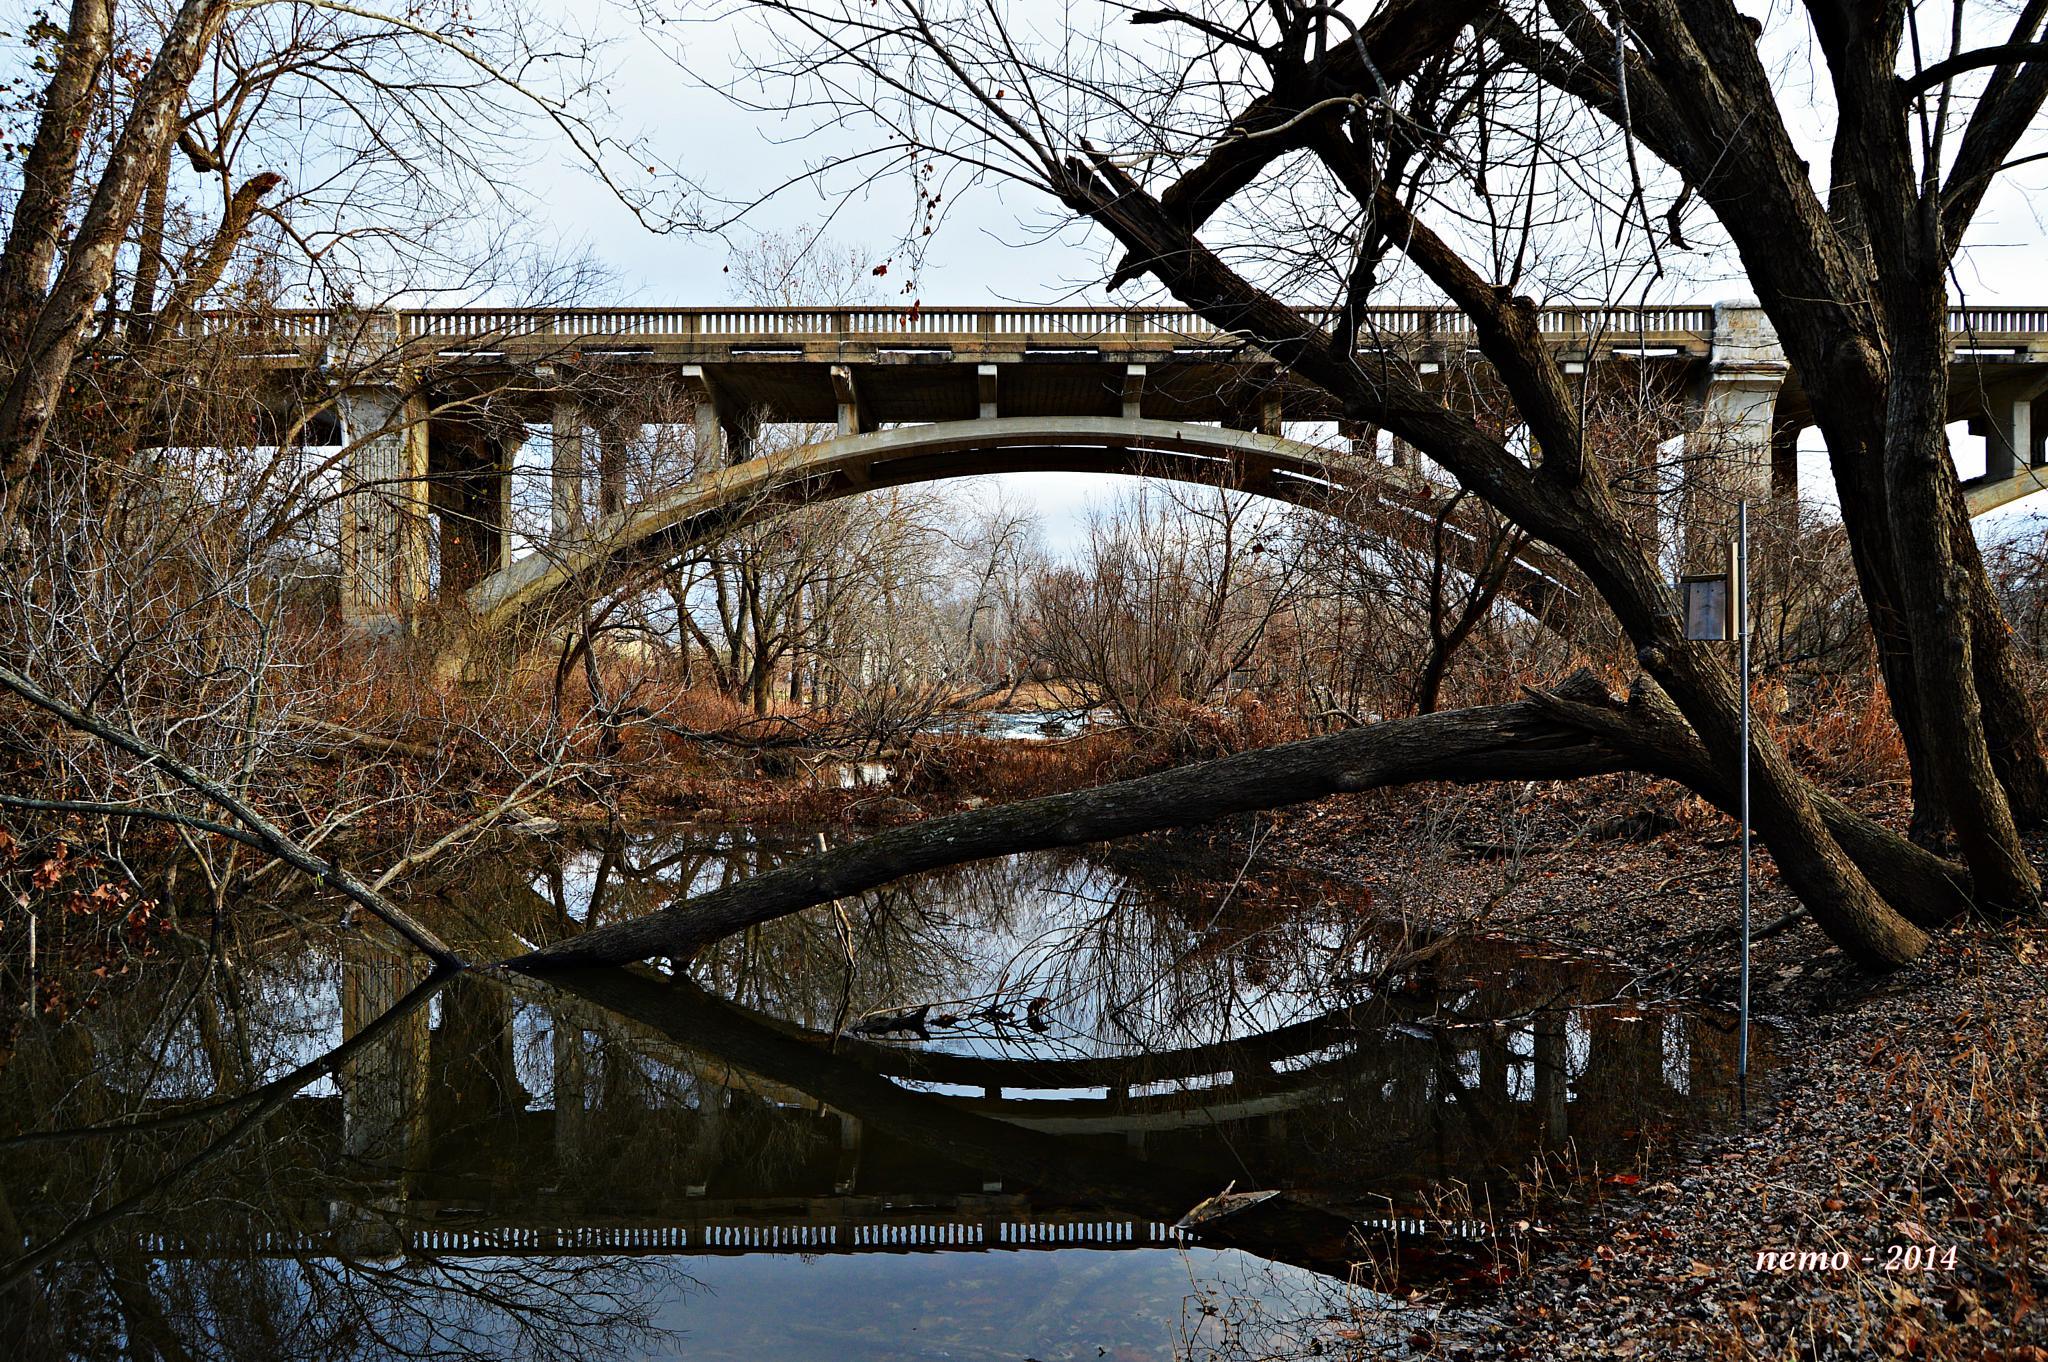 Reflection of the Bridge by Nemo